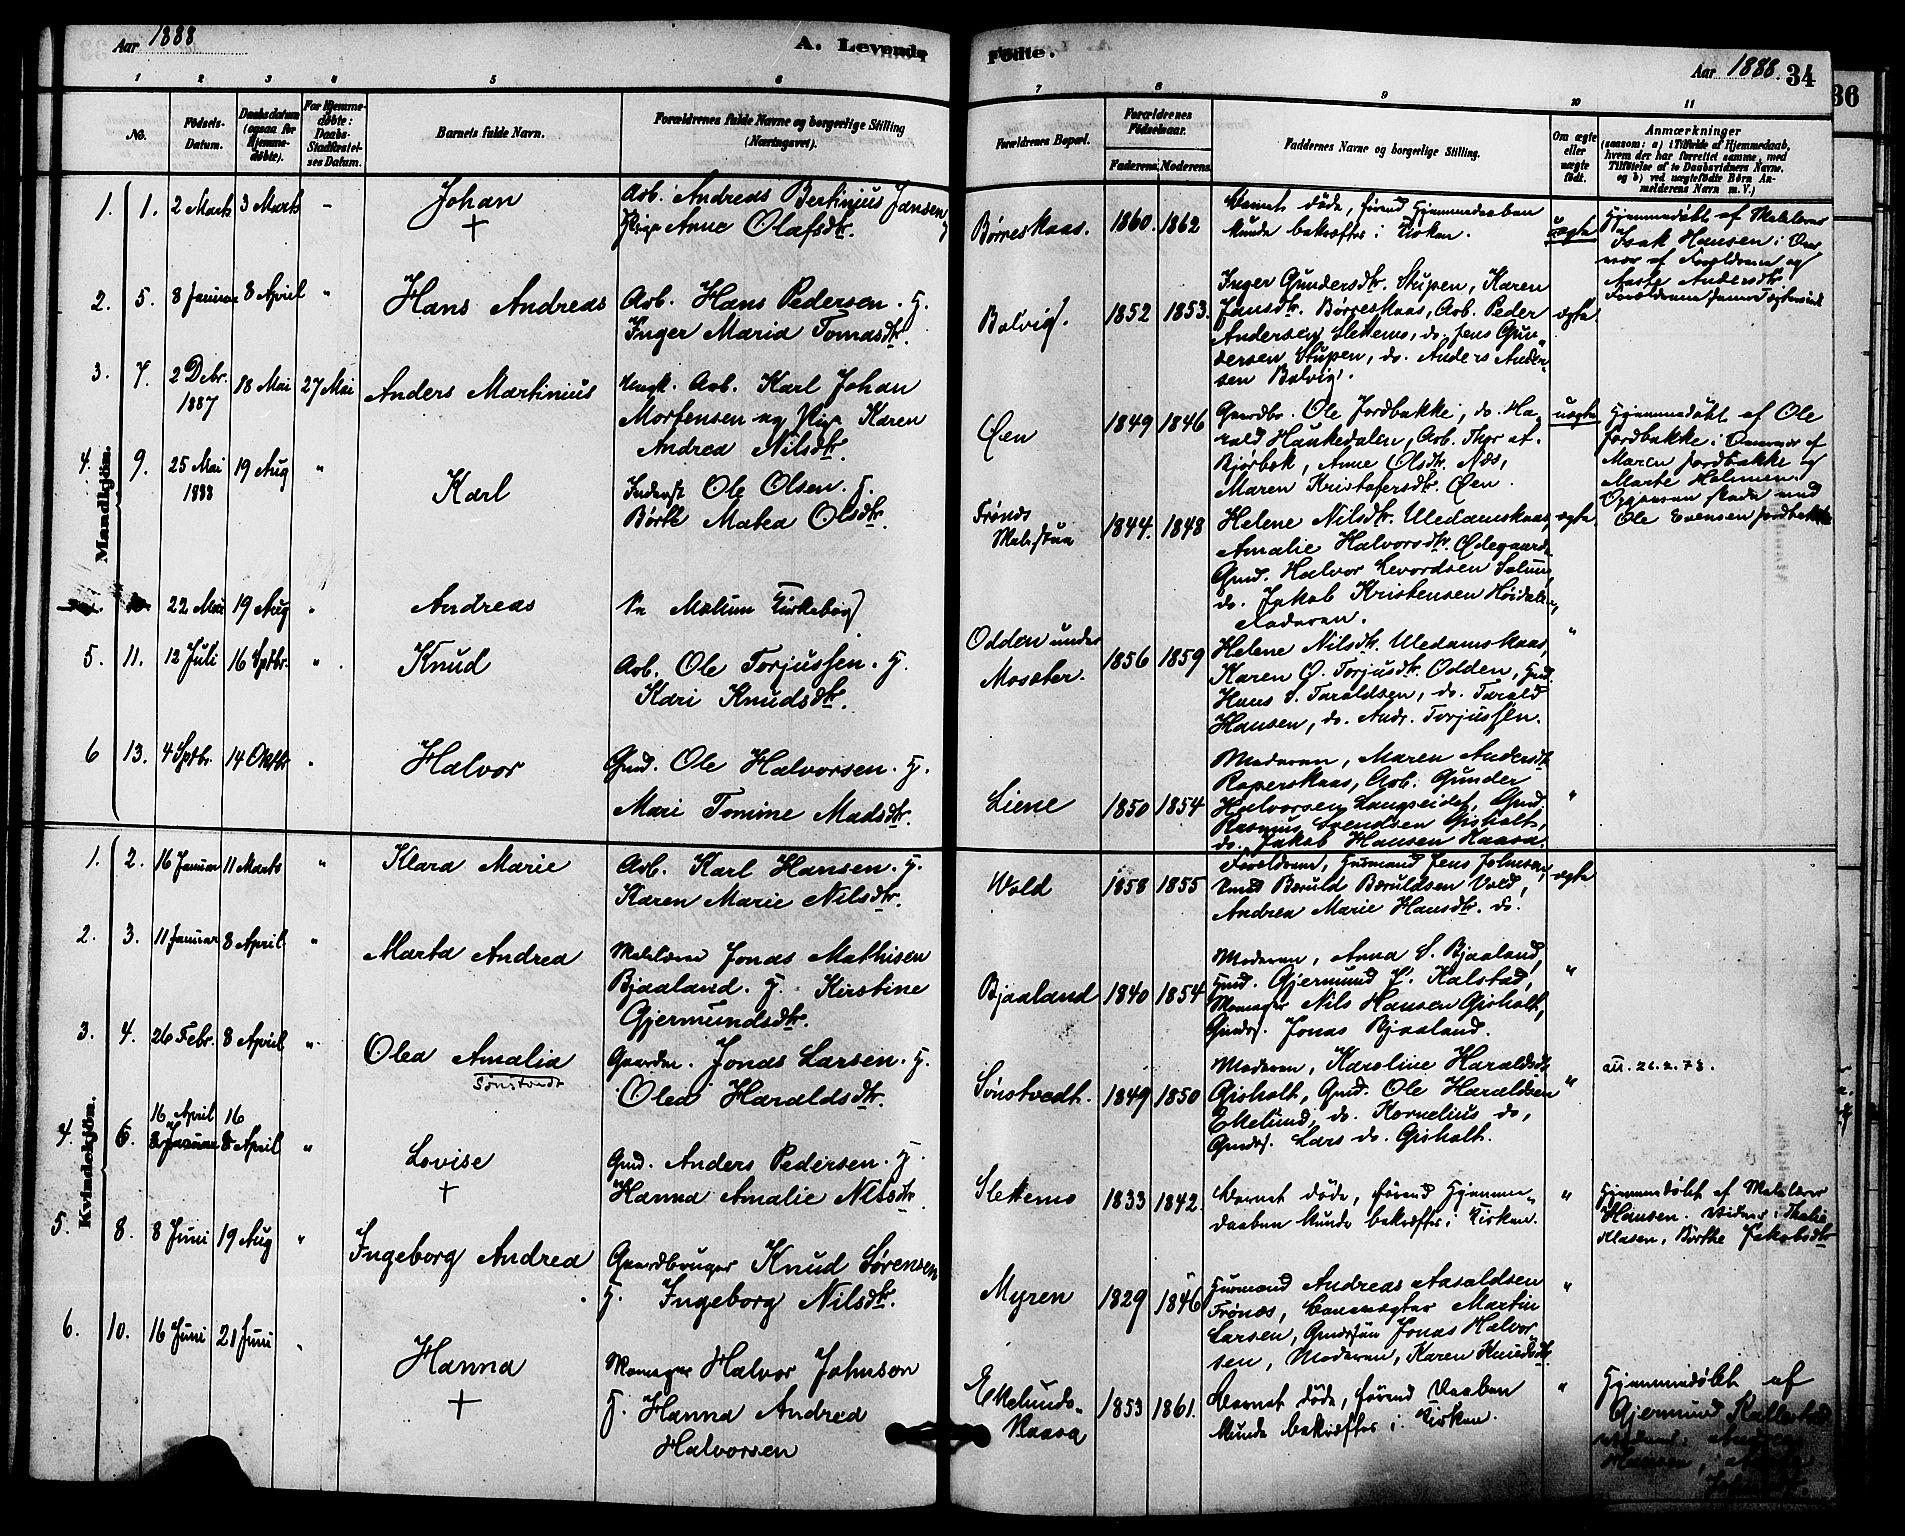 SAKO, Solum kirkebøker, F/Fc/L0001: Ministerialbok nr. III 1, 1877-1891, s. 34